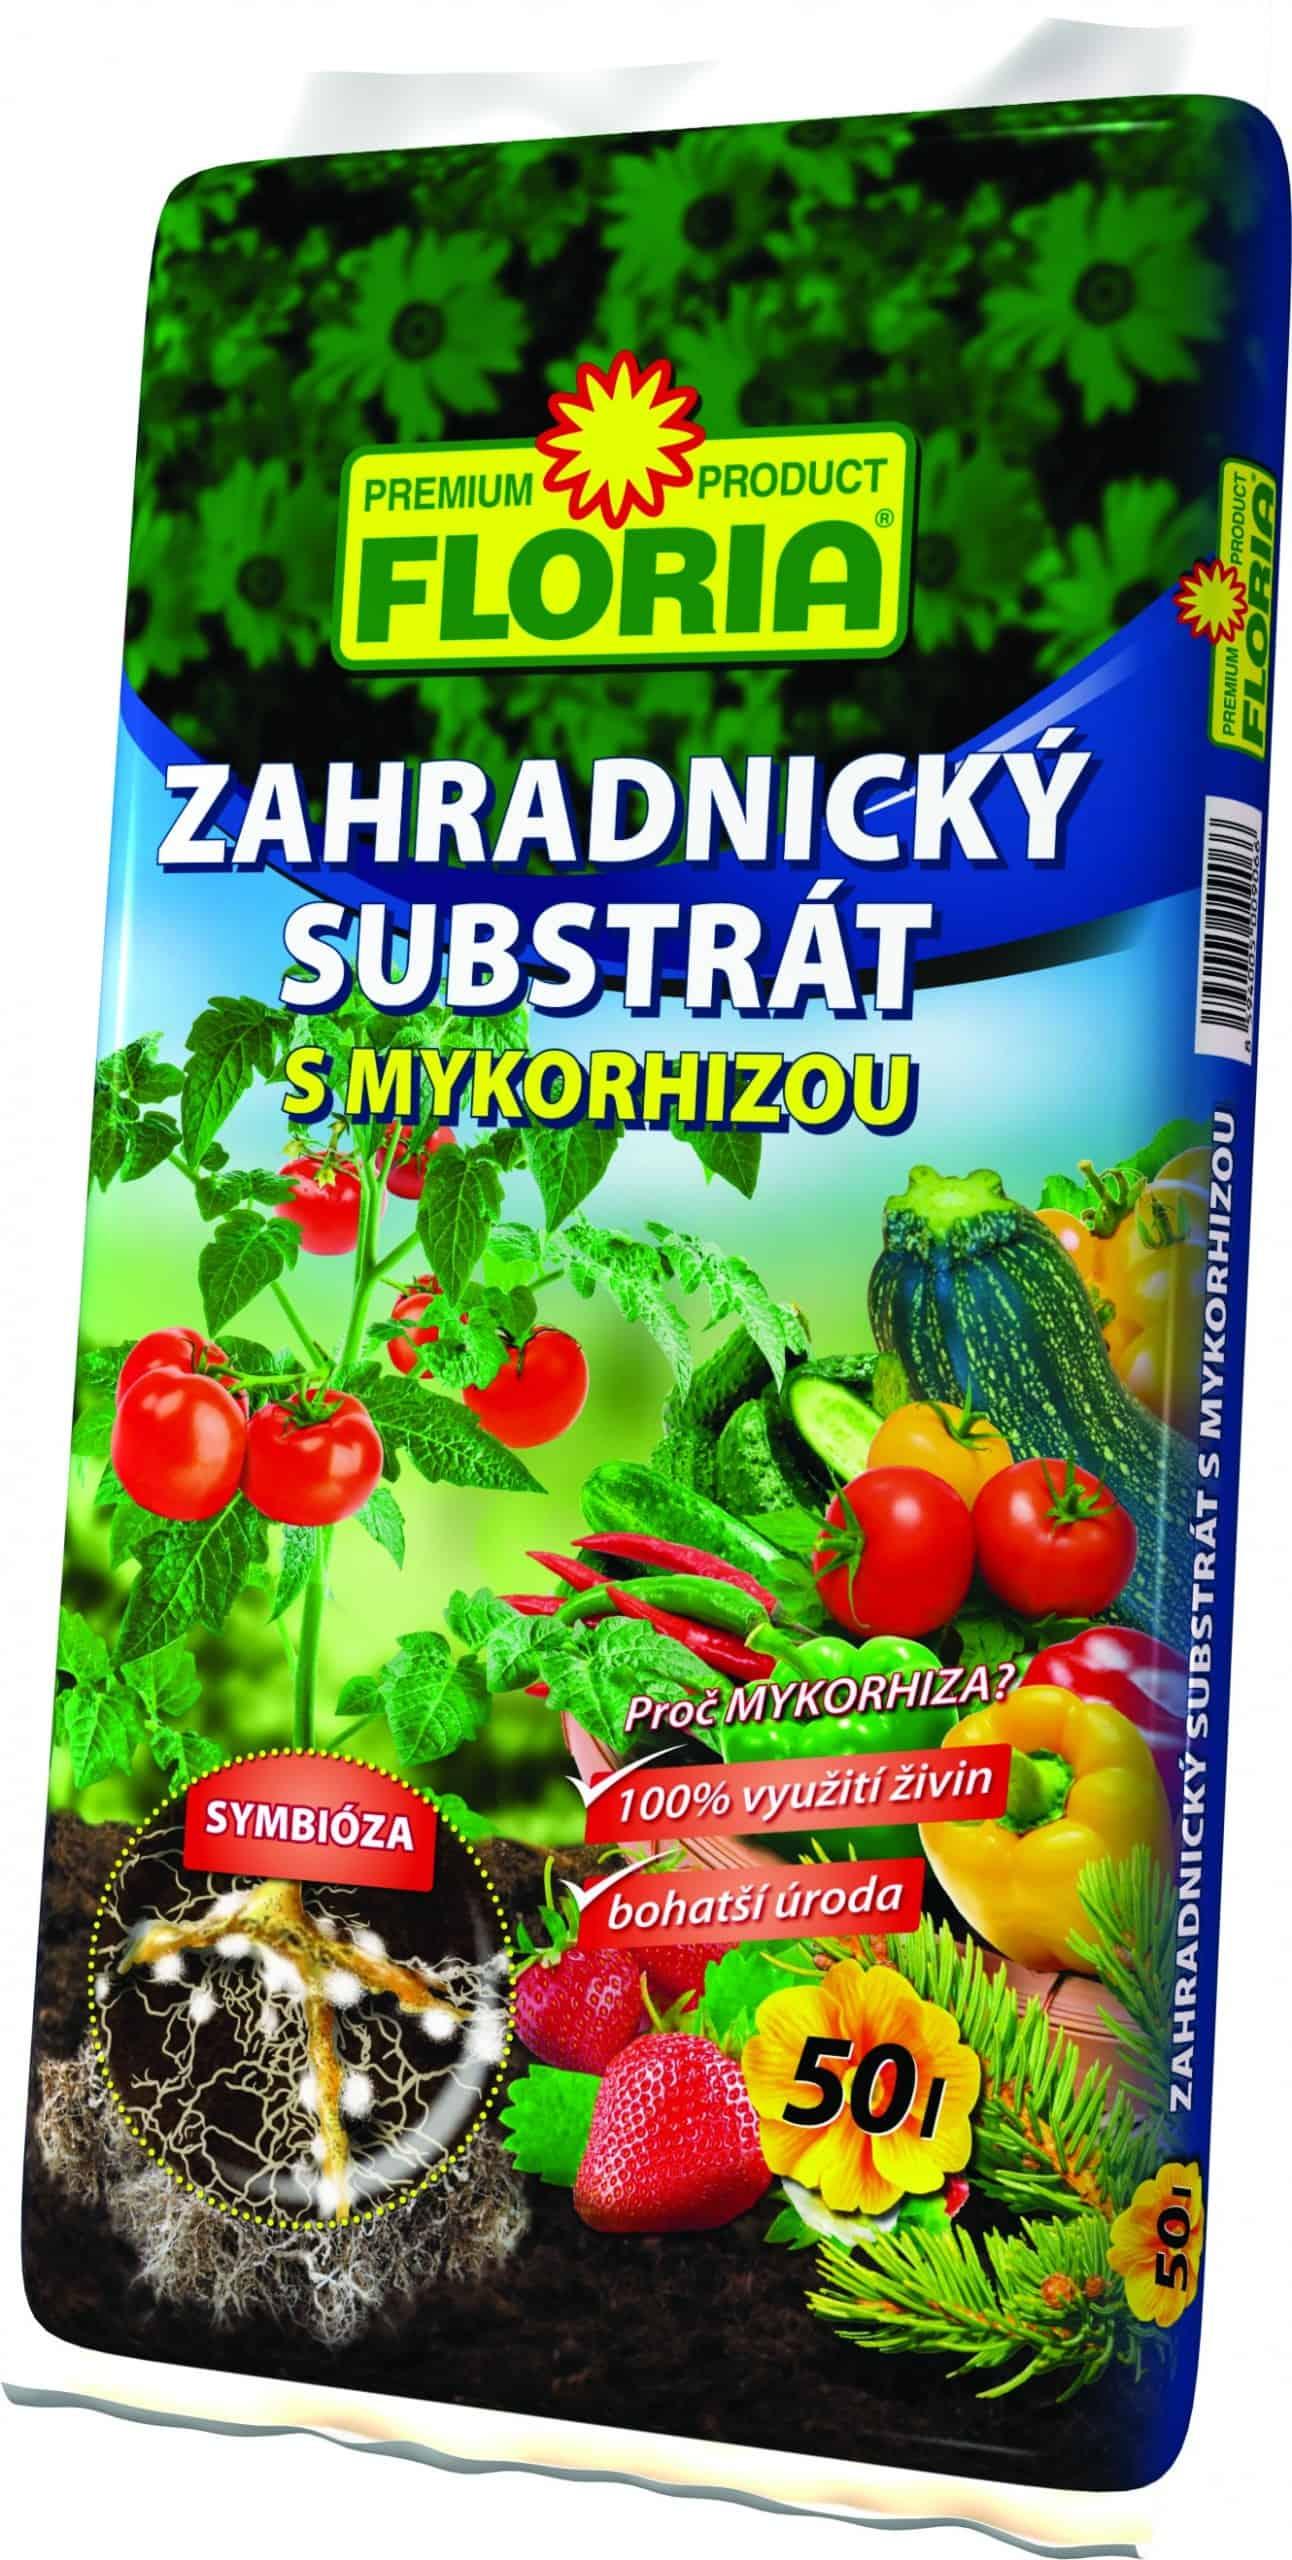 FLORIA Záhradnícky substrát s mykorhizou 50l